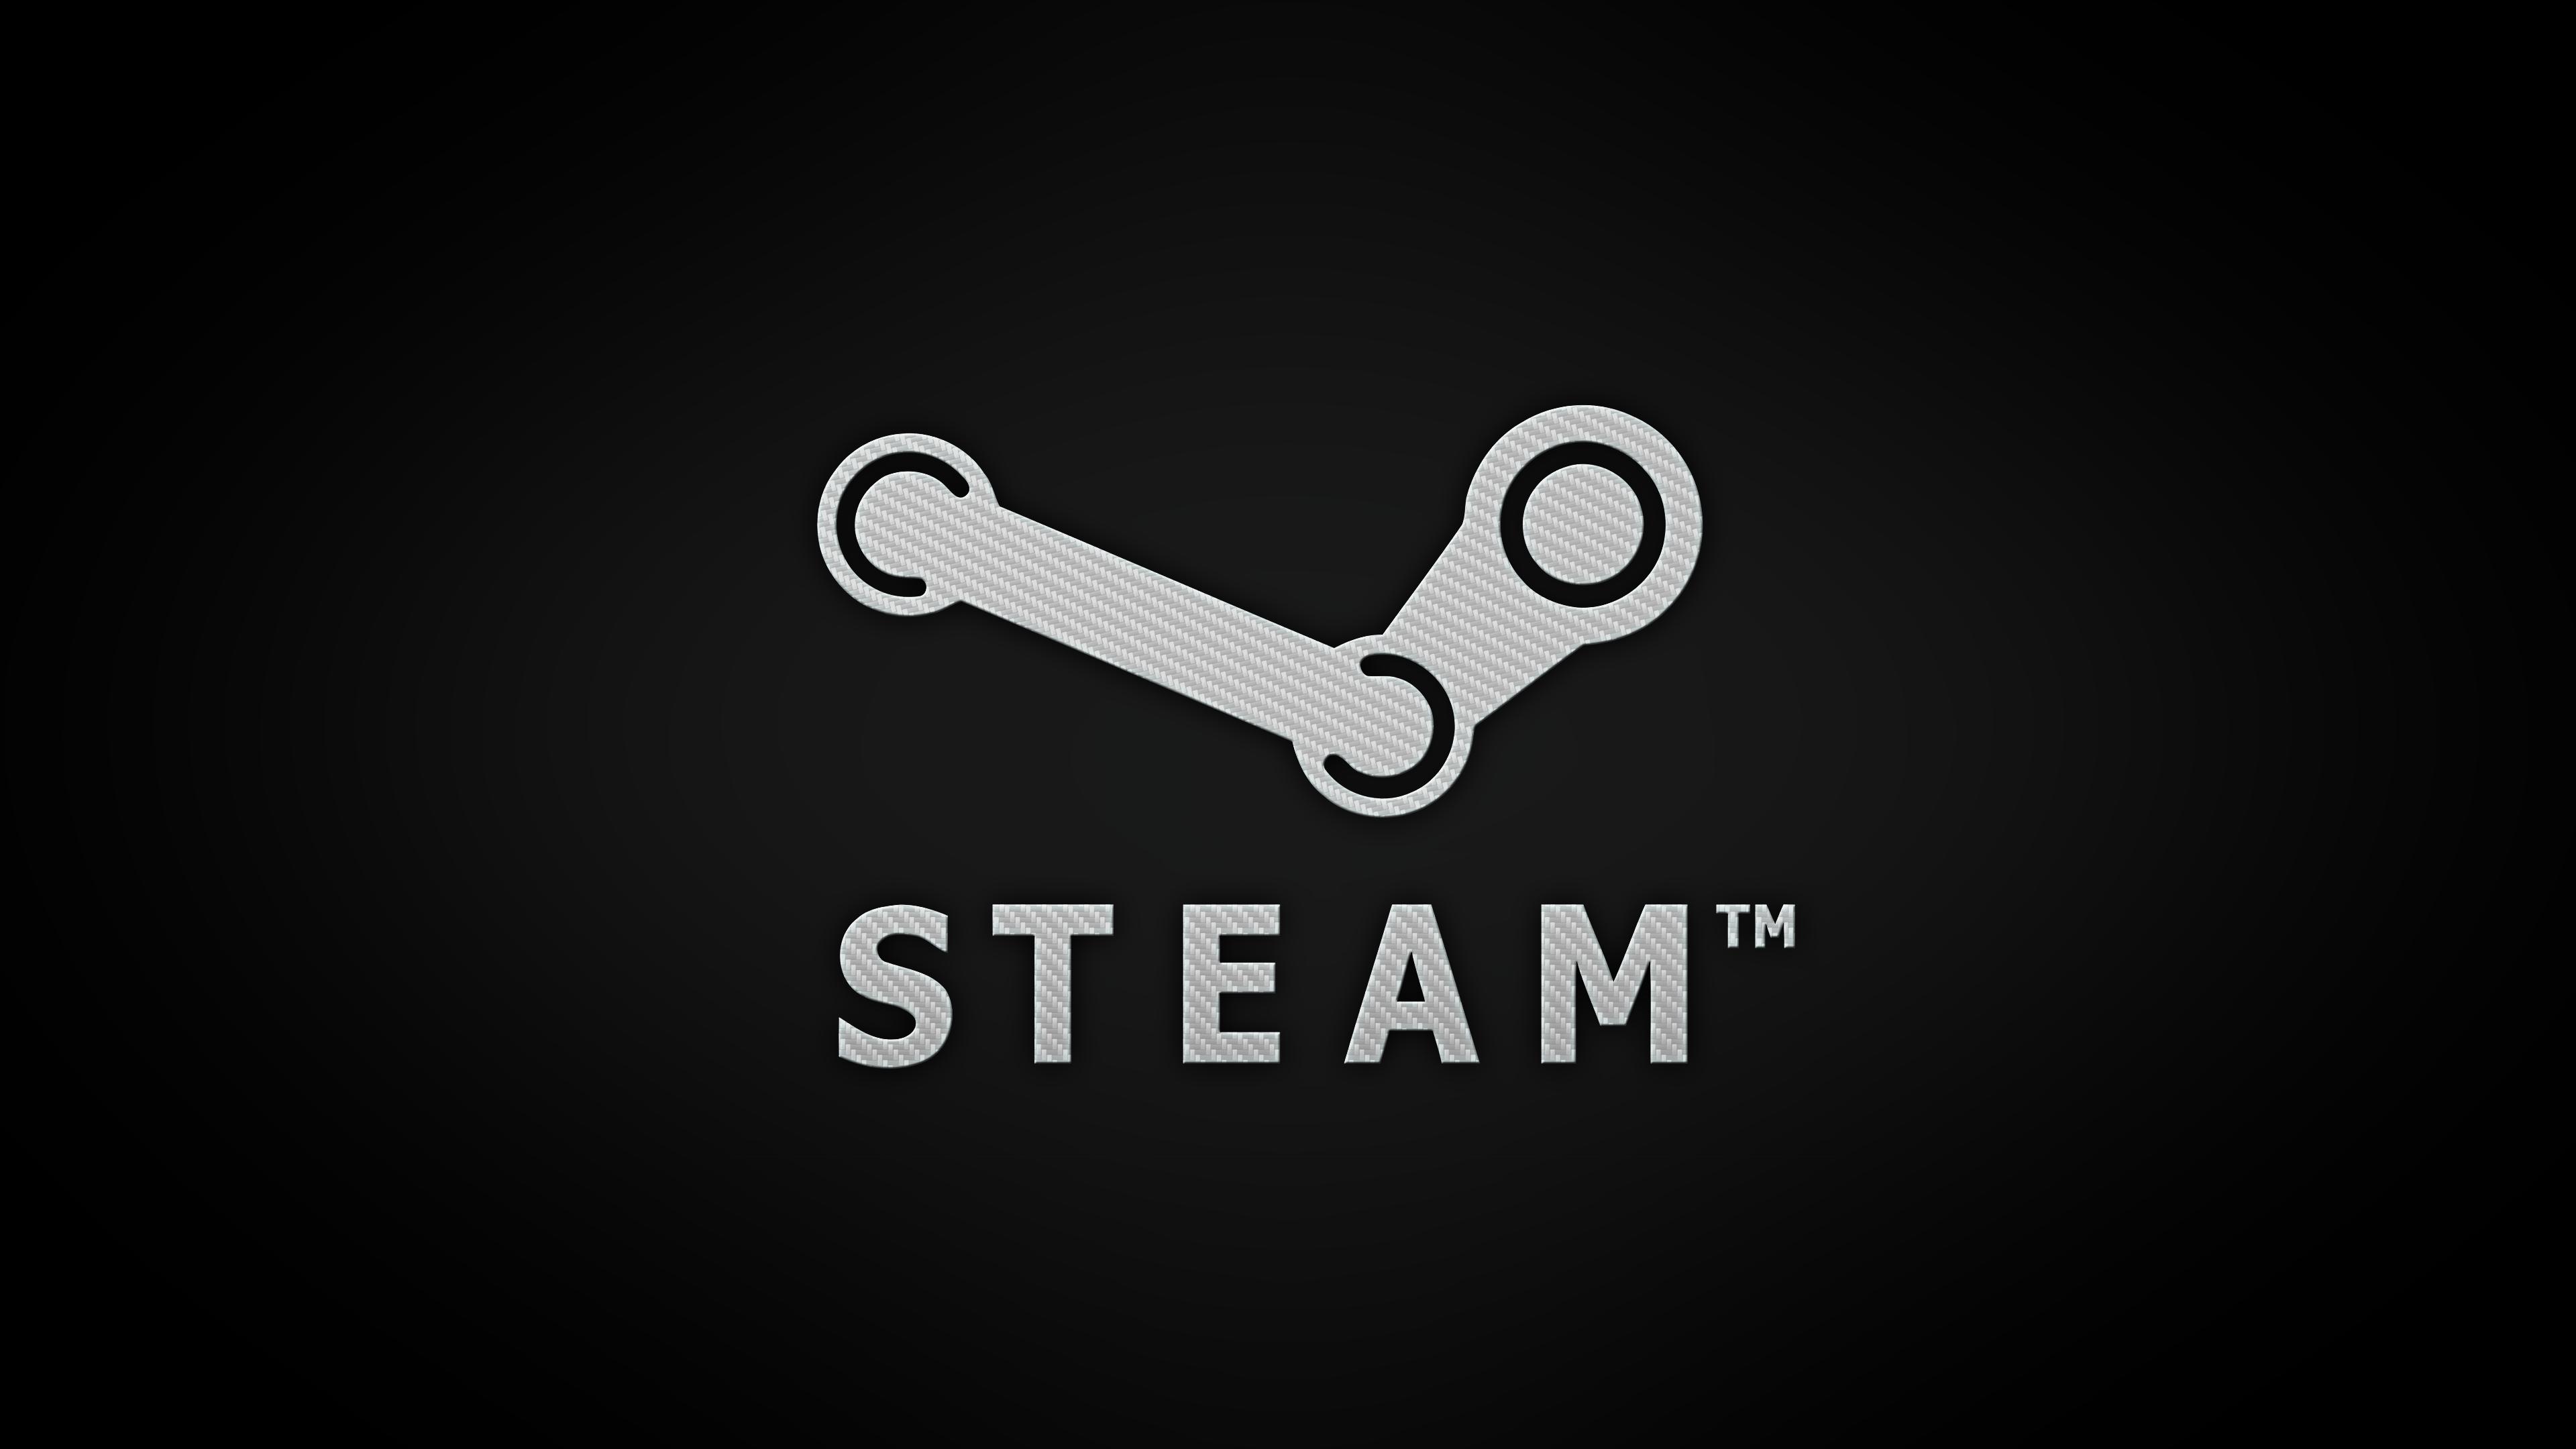 Steam Brand Logo, HD Logo, 4k Wallpapers, Images